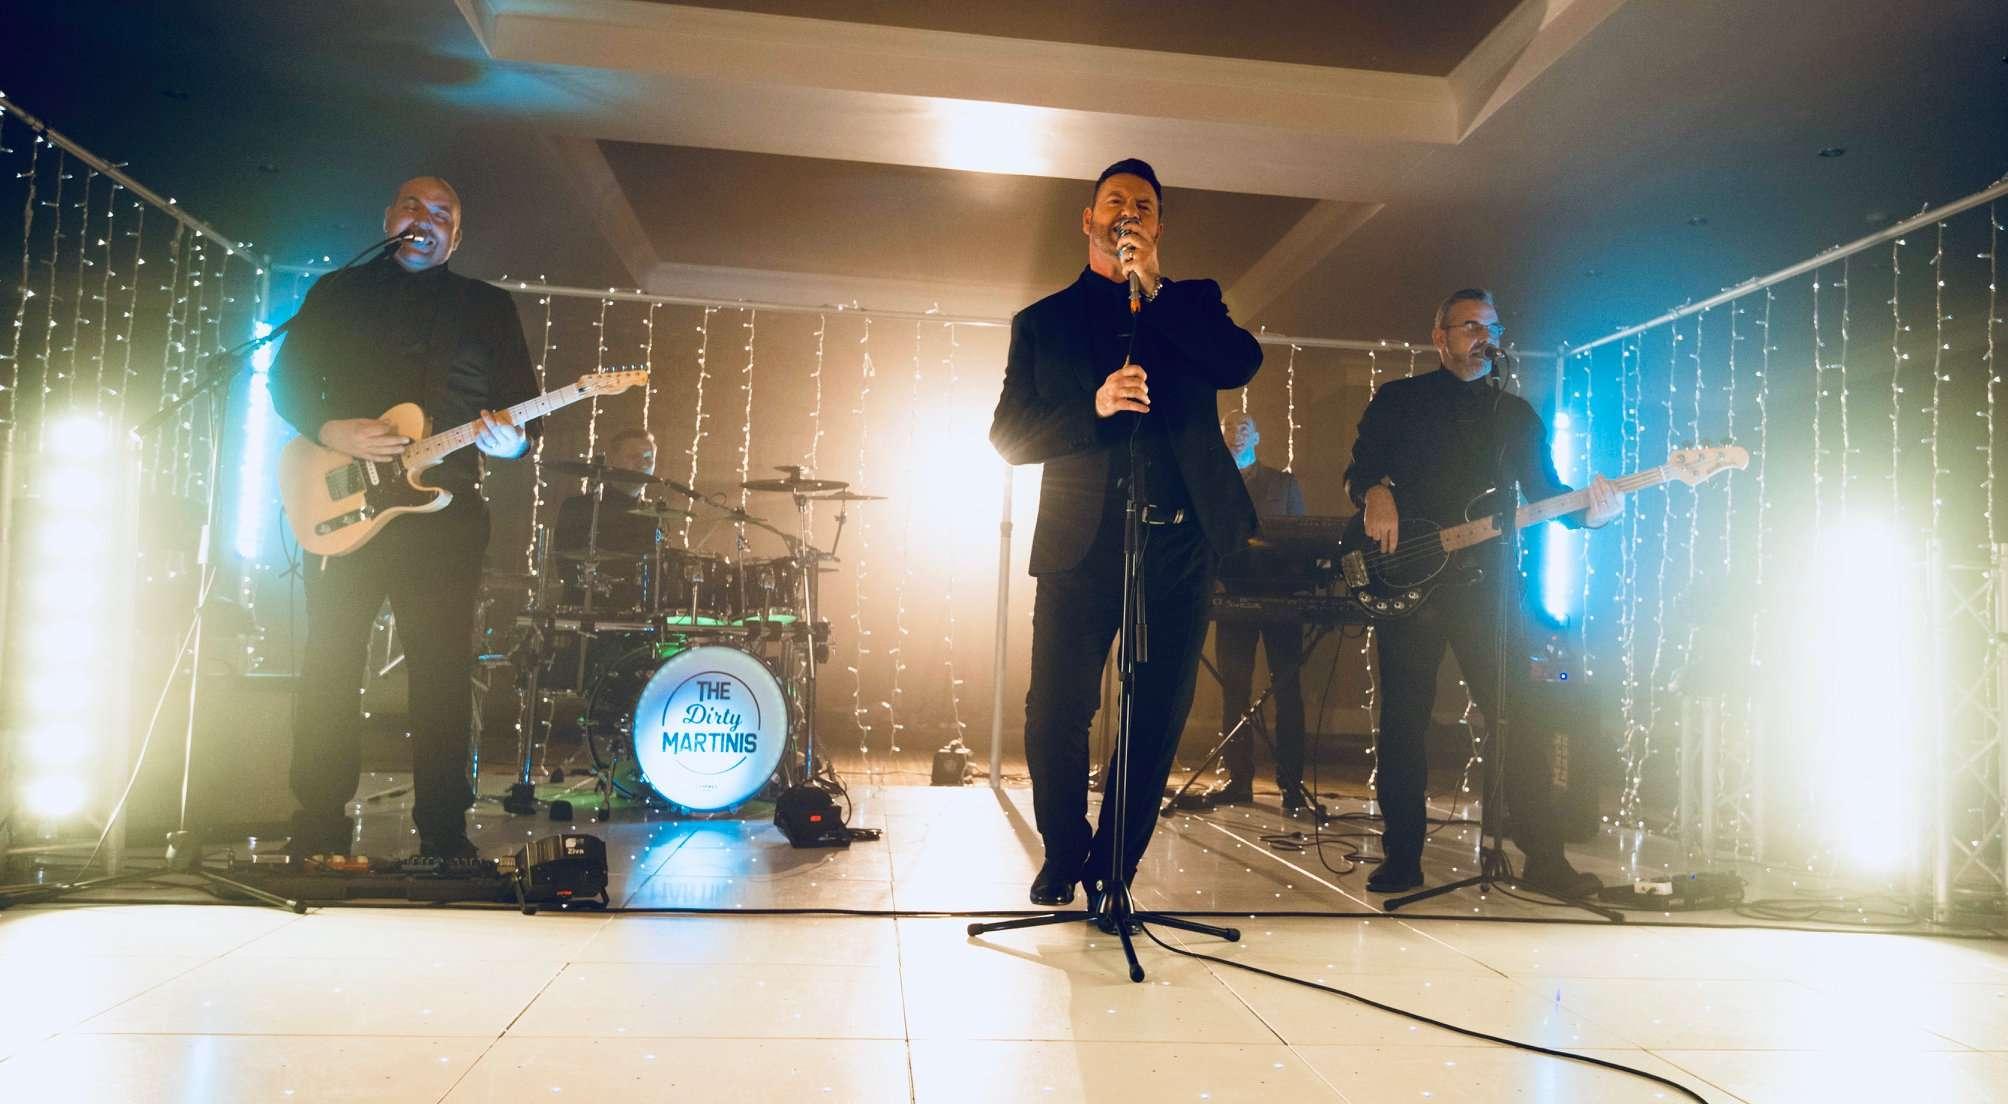 Most Popular Edinburgh Wedding Band The Dirty Martinis